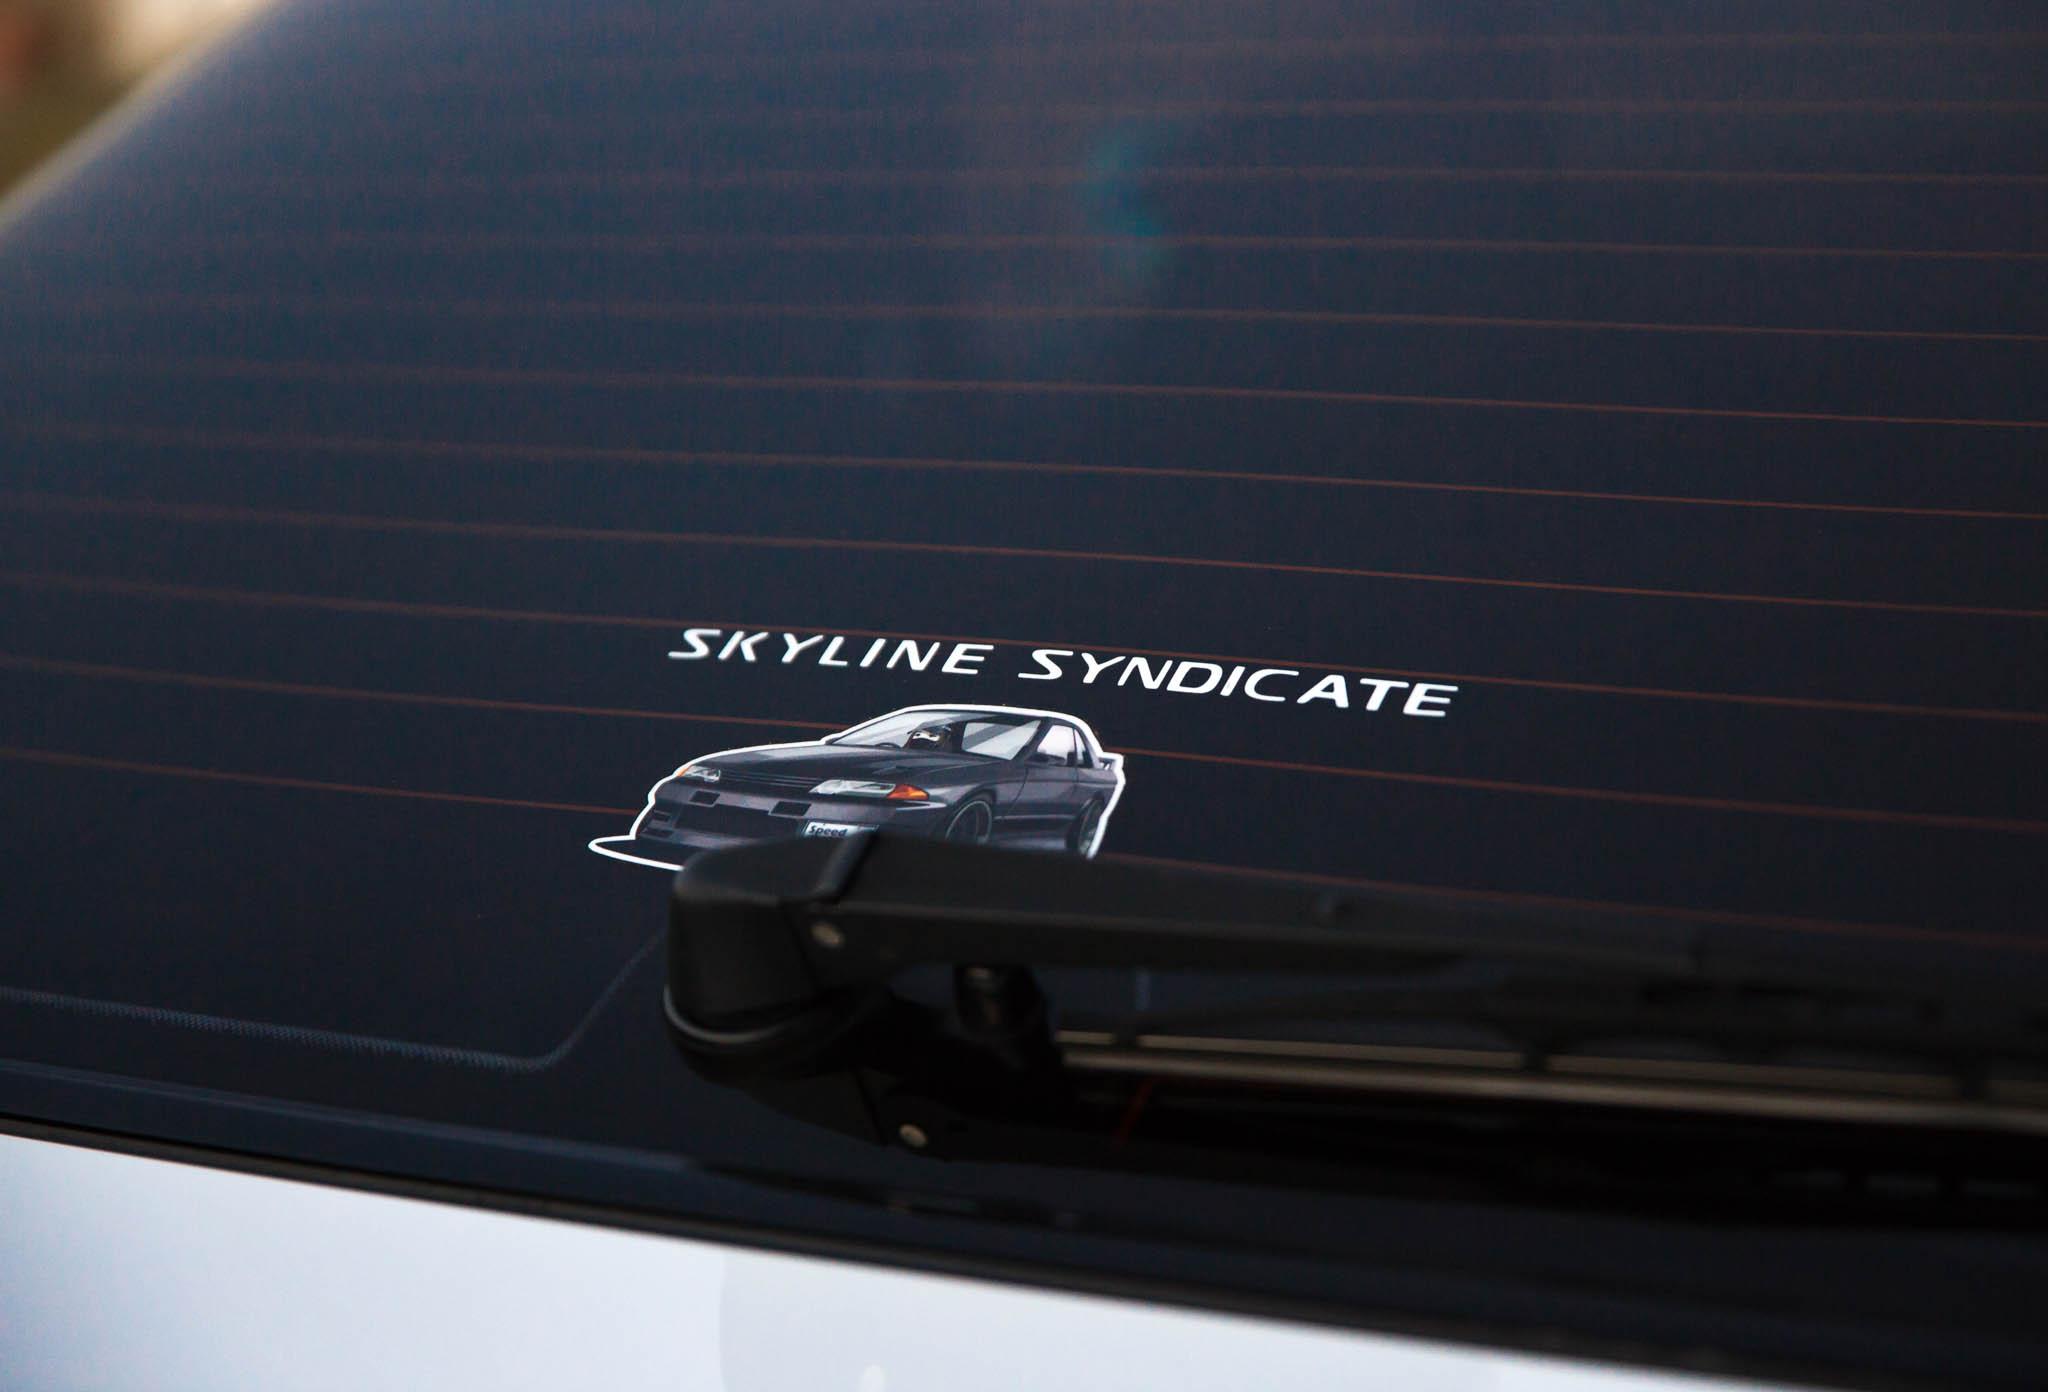 Stay_Driven_Skyline_Syndicate_Shoot_1-152.jpg